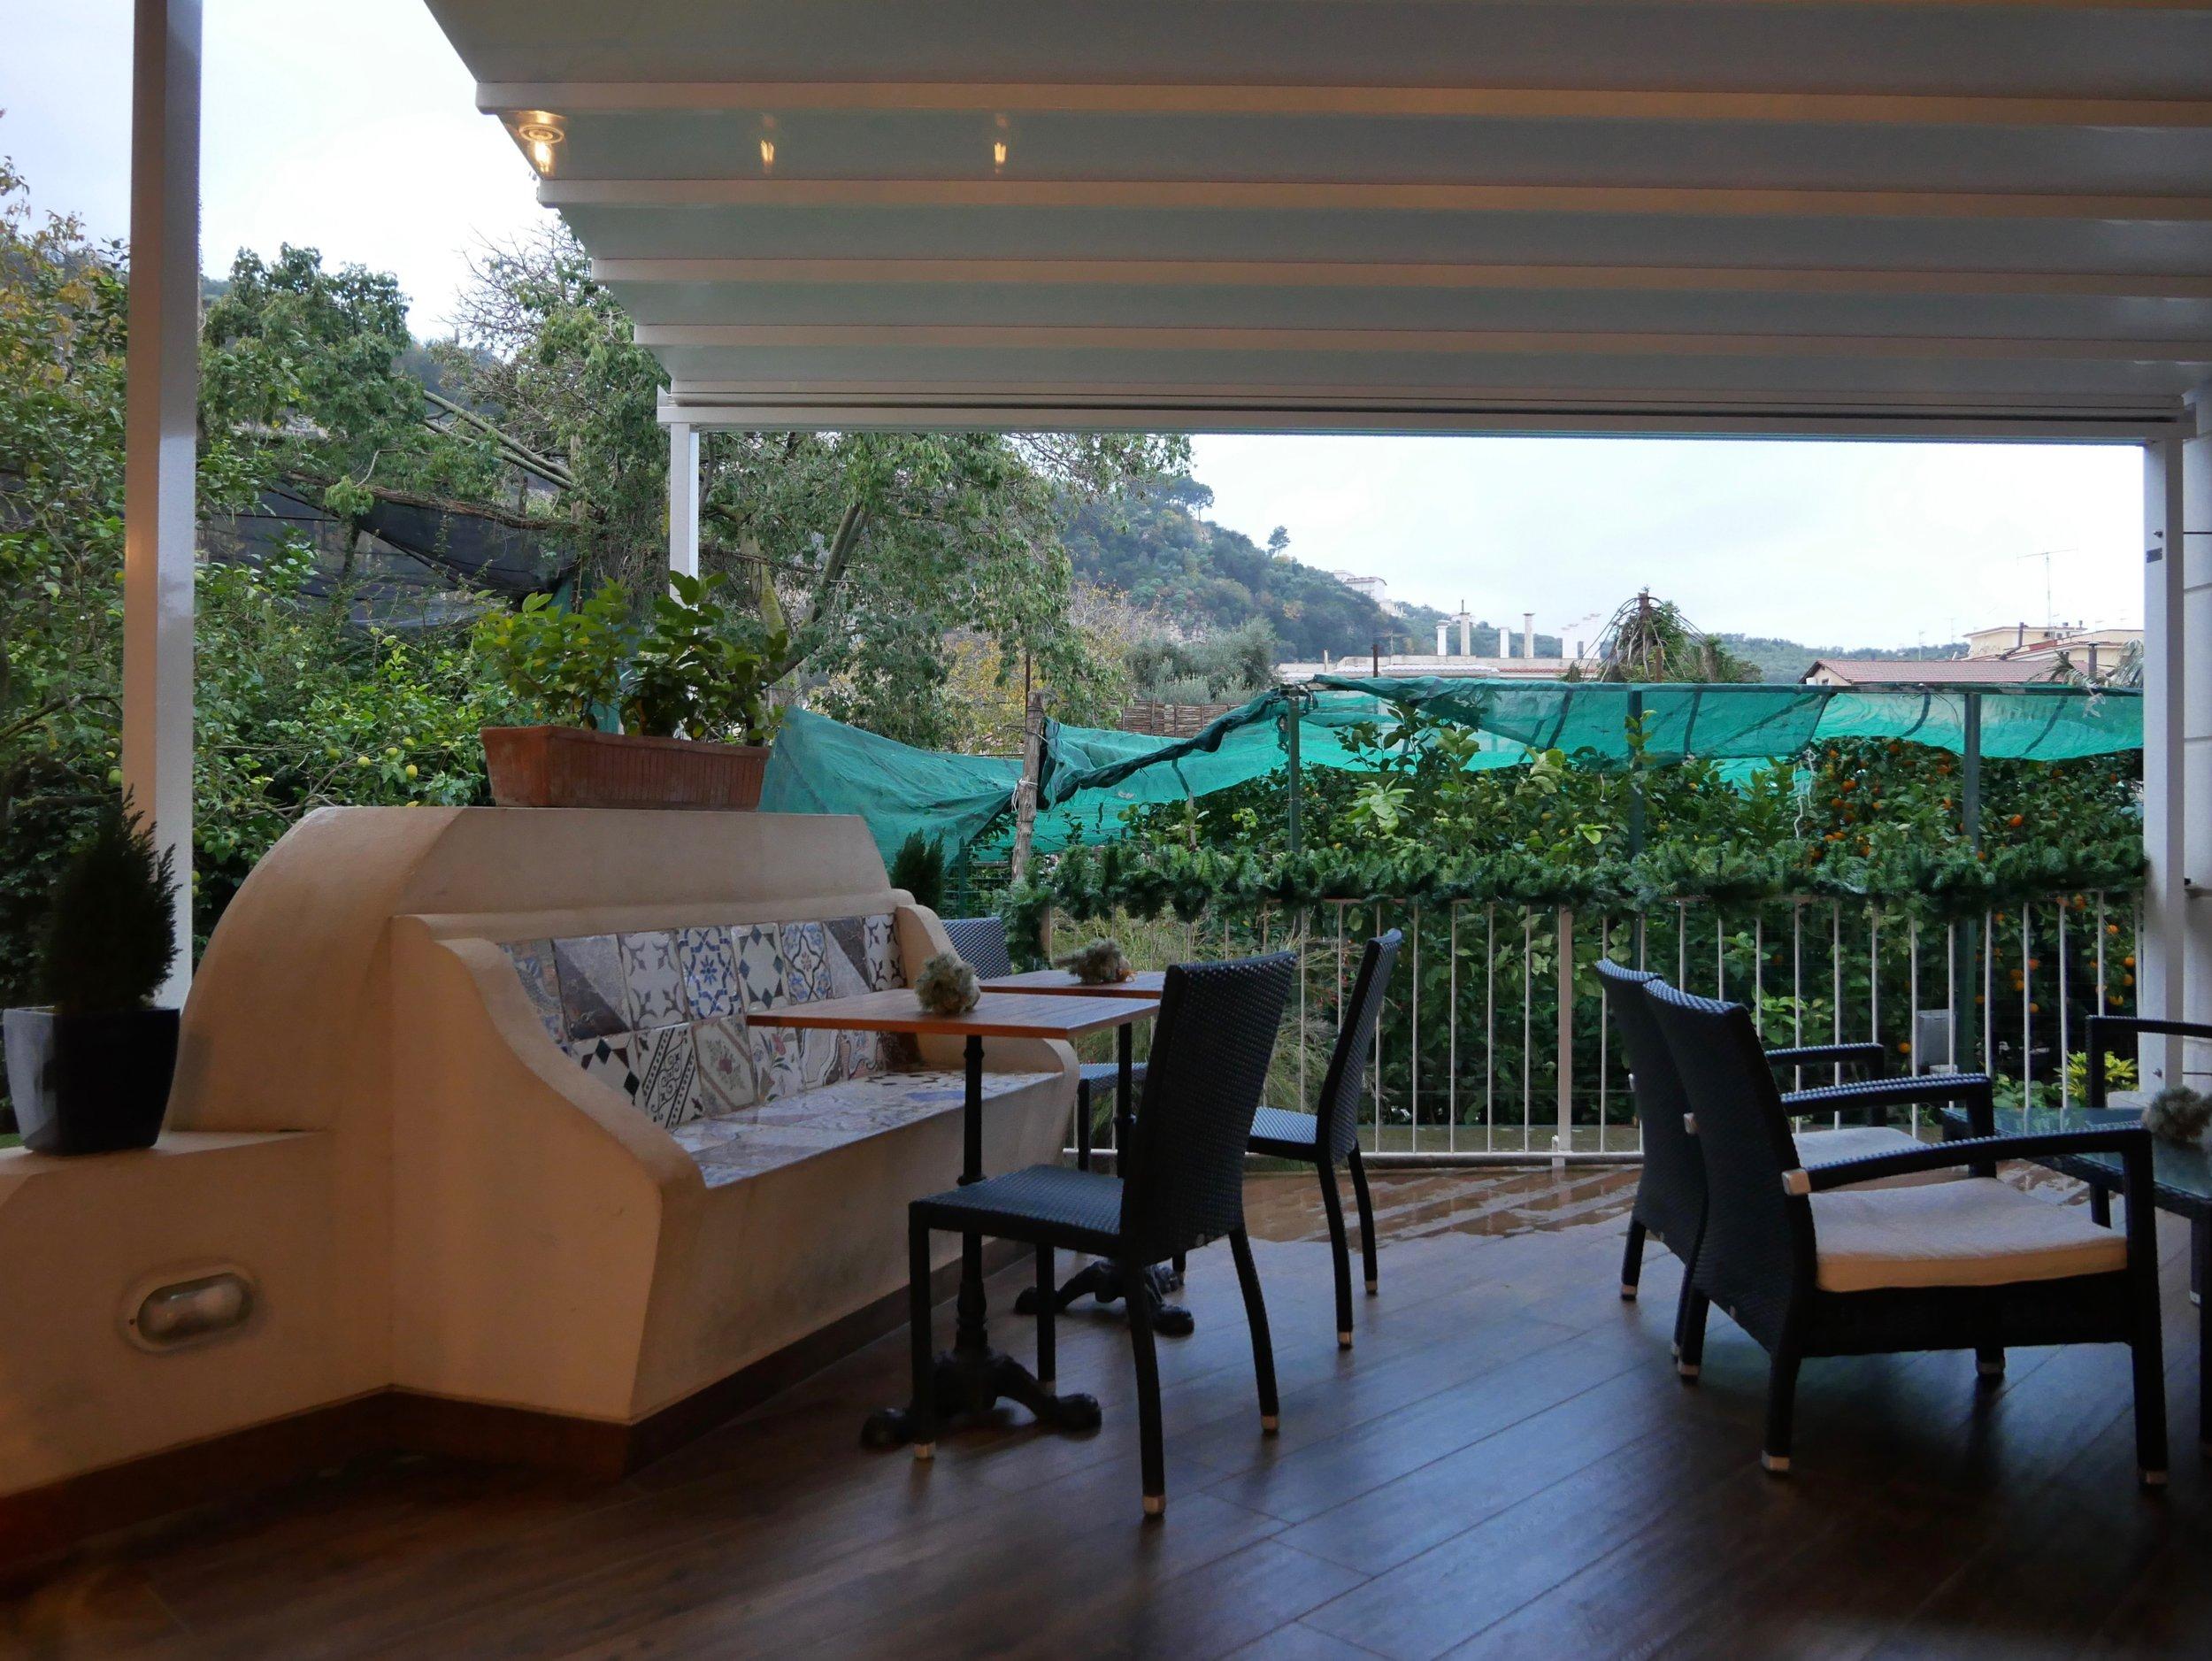 Hotel Mignon Sorrento outdoor seating.jpg